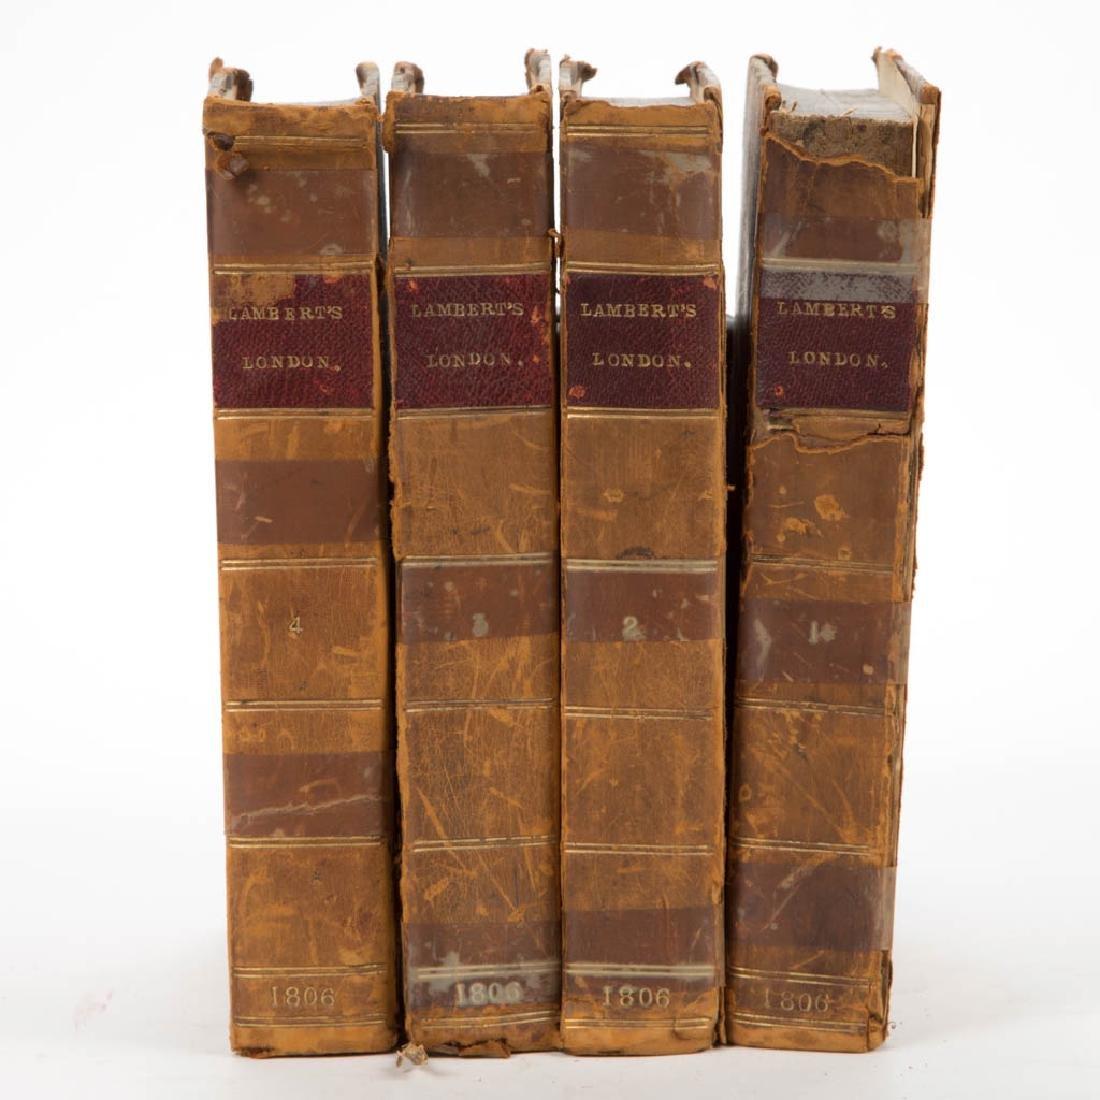 BRITISH HISTORICAL LONDON SURVEY / TRAVEL VOLUMES, SET